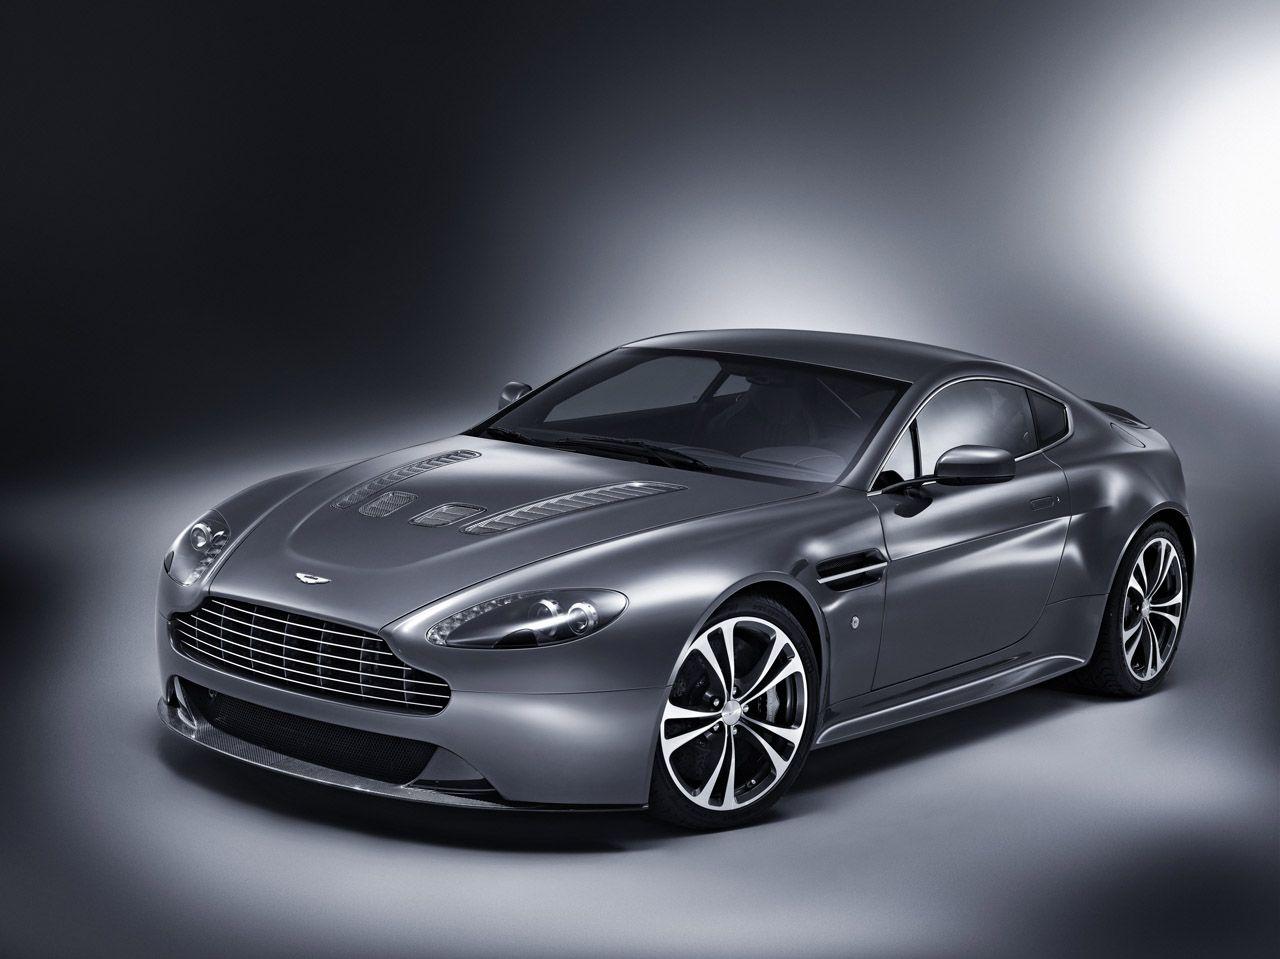 Aston Martin V12 Vantage 2 Wallpapers Hd Wallpapers Aston Martin V12 Vantage Aston Martin V12 Aston Martin Vantage